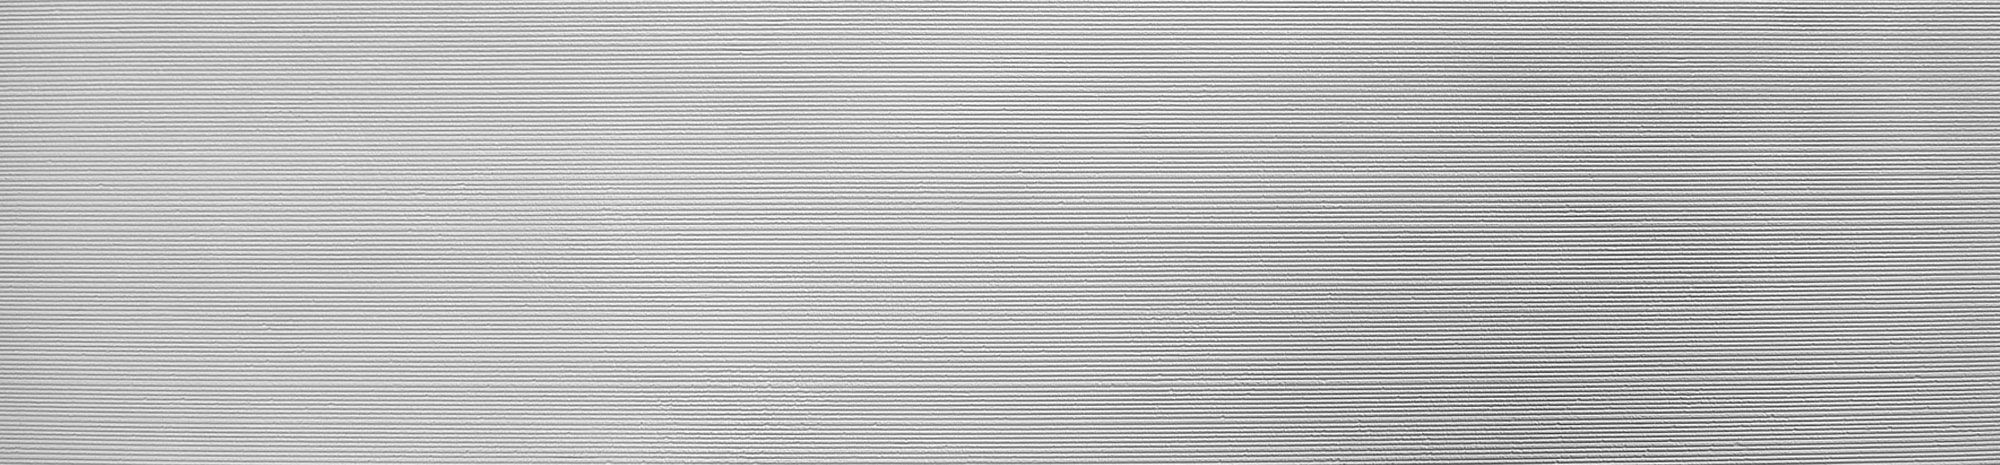 Pin by Антон on Materials Linen wallpaper, Textured